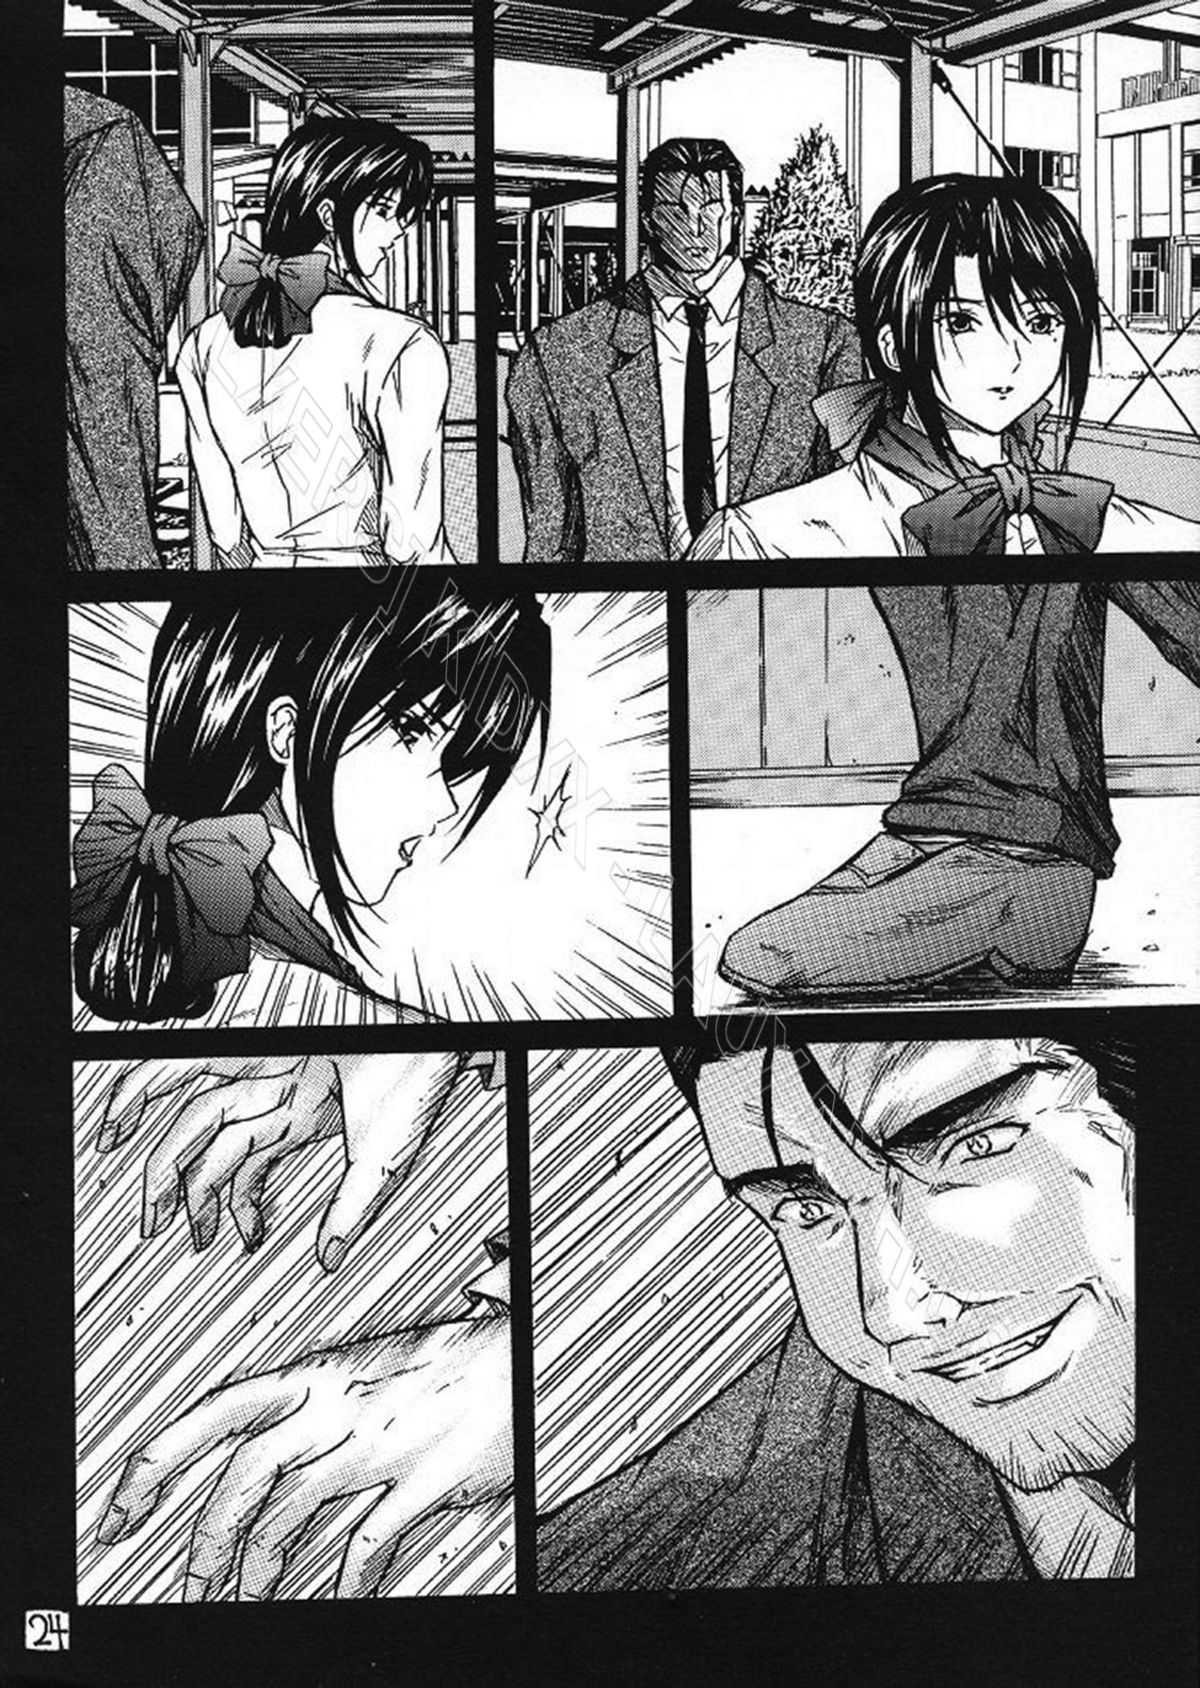 TruyenHay.Com - Ảnh 23 - Ryoujoku Rensa Chapter 2